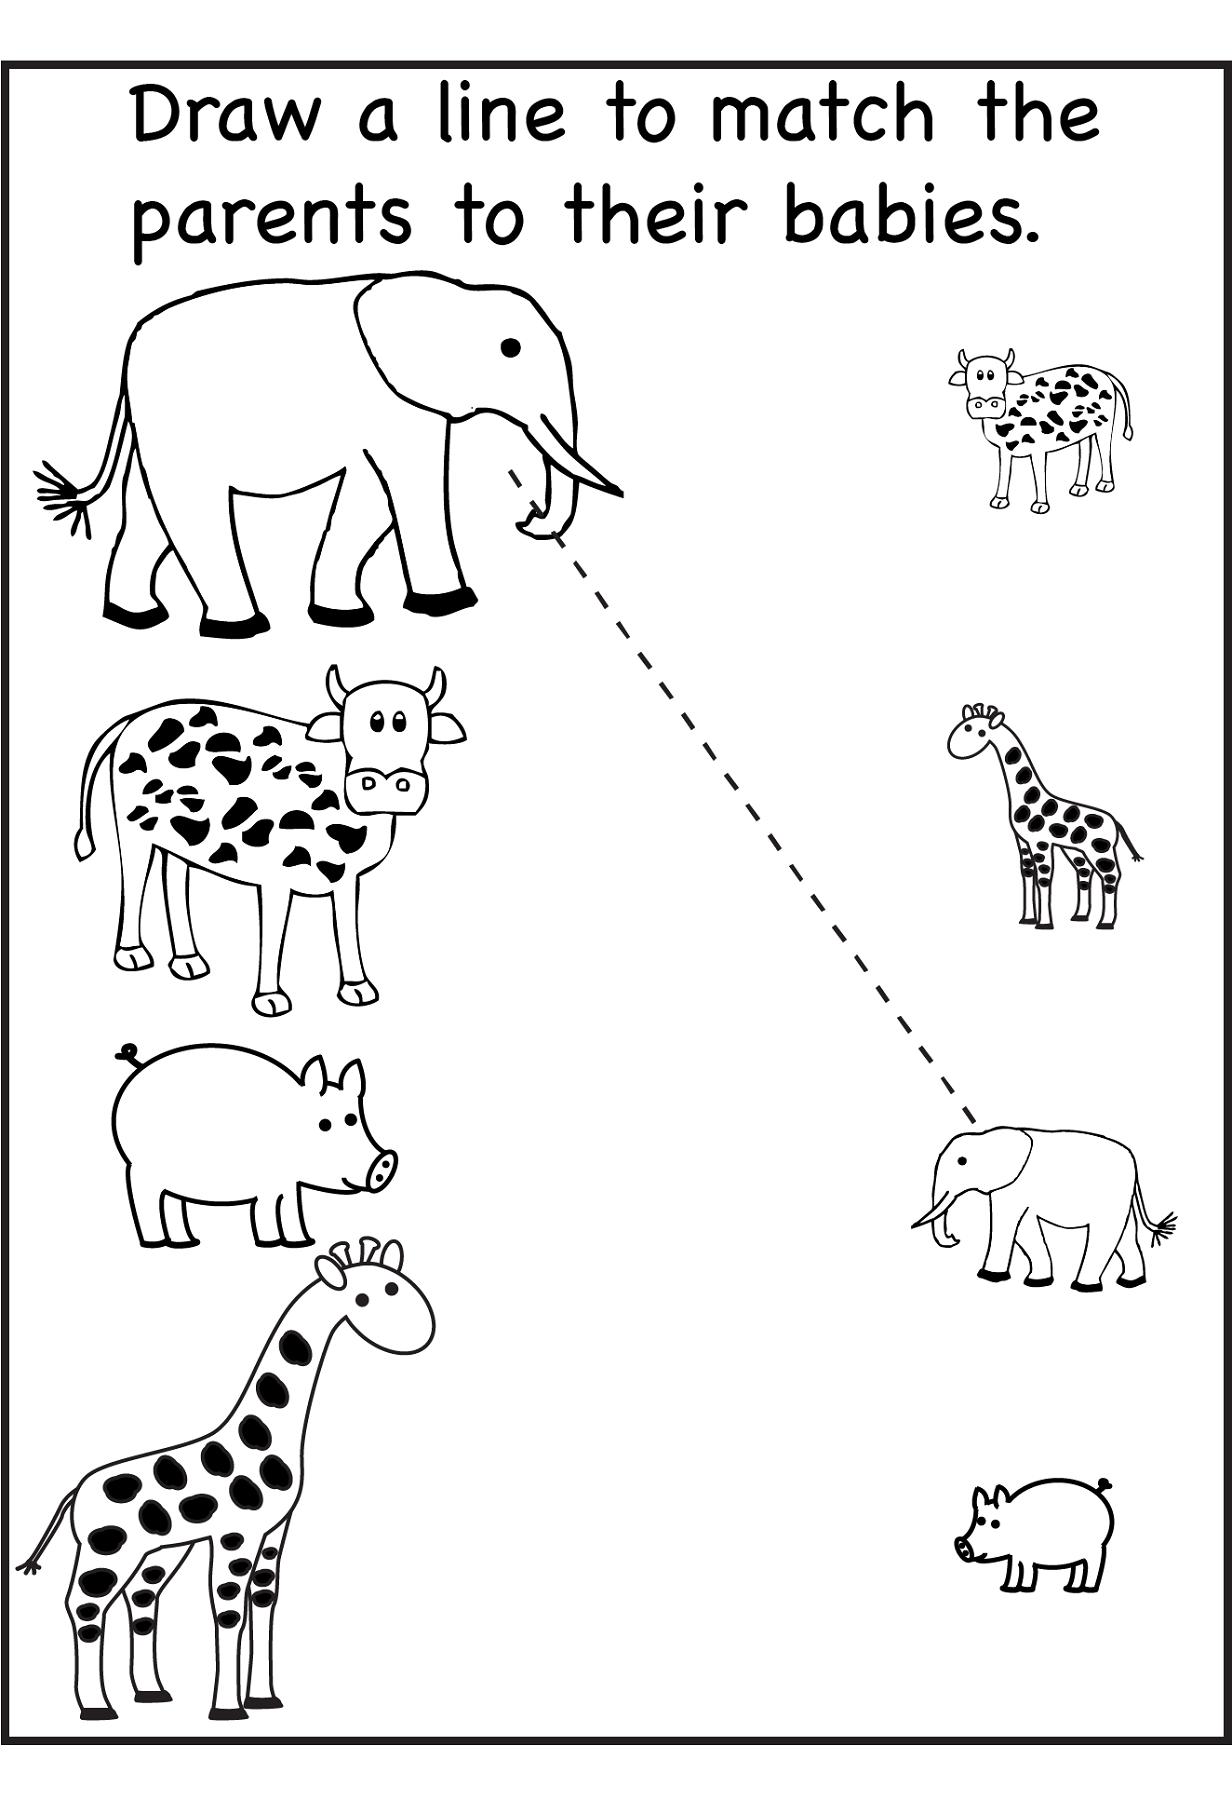 Printable Activity Sheets For Kids | Preschool | Pinterest | Toddler - Free Printable Activity Sheets For Kids